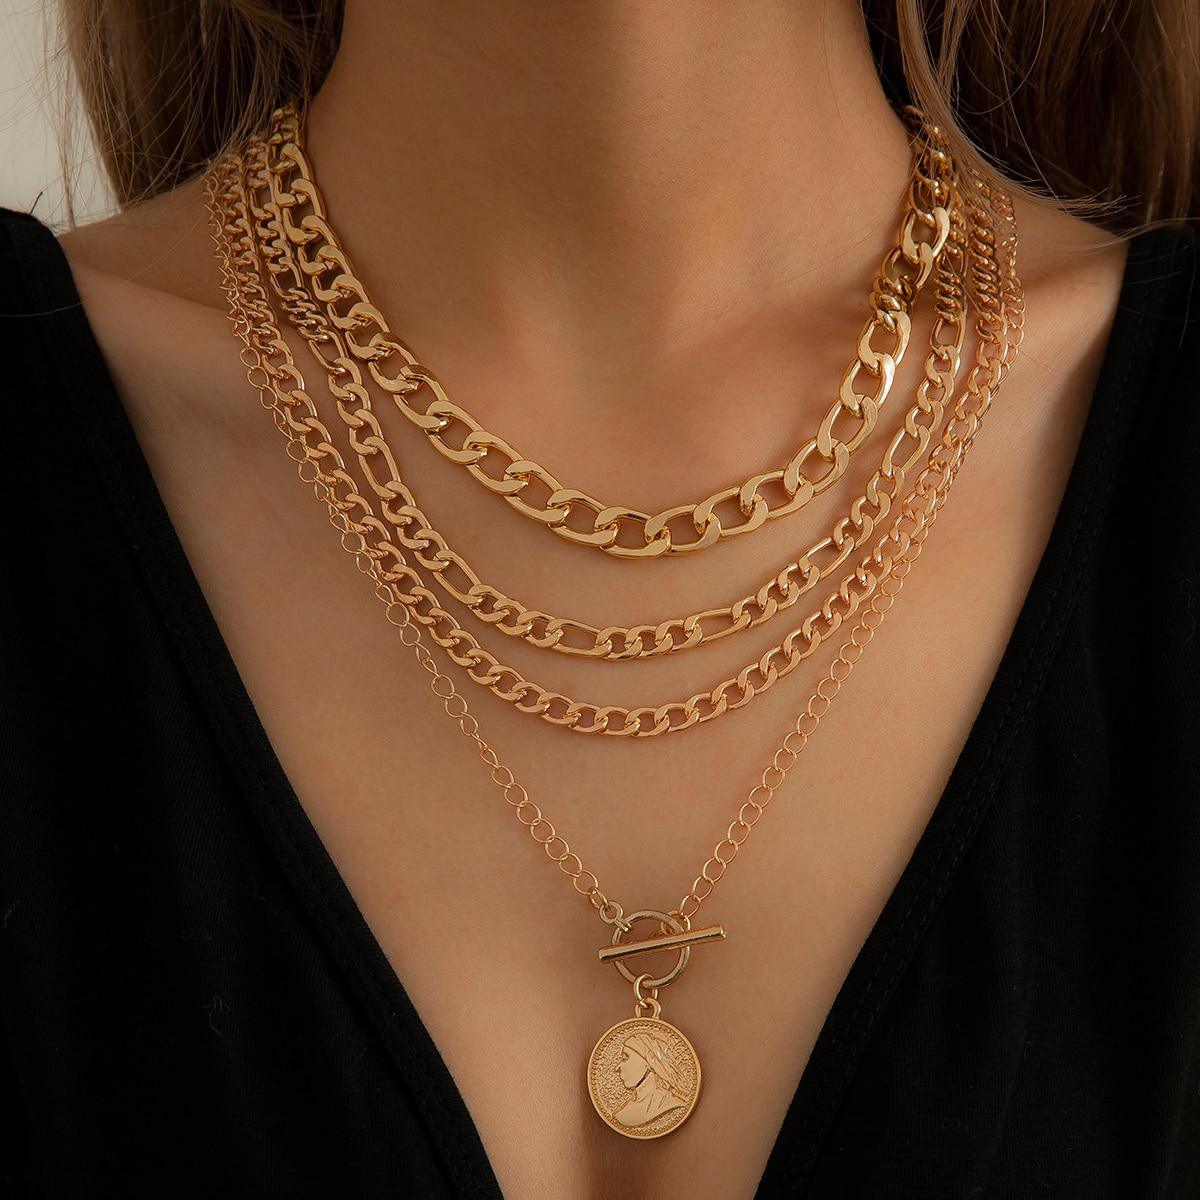 Ingemark Vintage Coin Avatar Pendant Choker Necklace for Men Women Goth Chain Punk Grunge Steampunk Jewelry Accessories